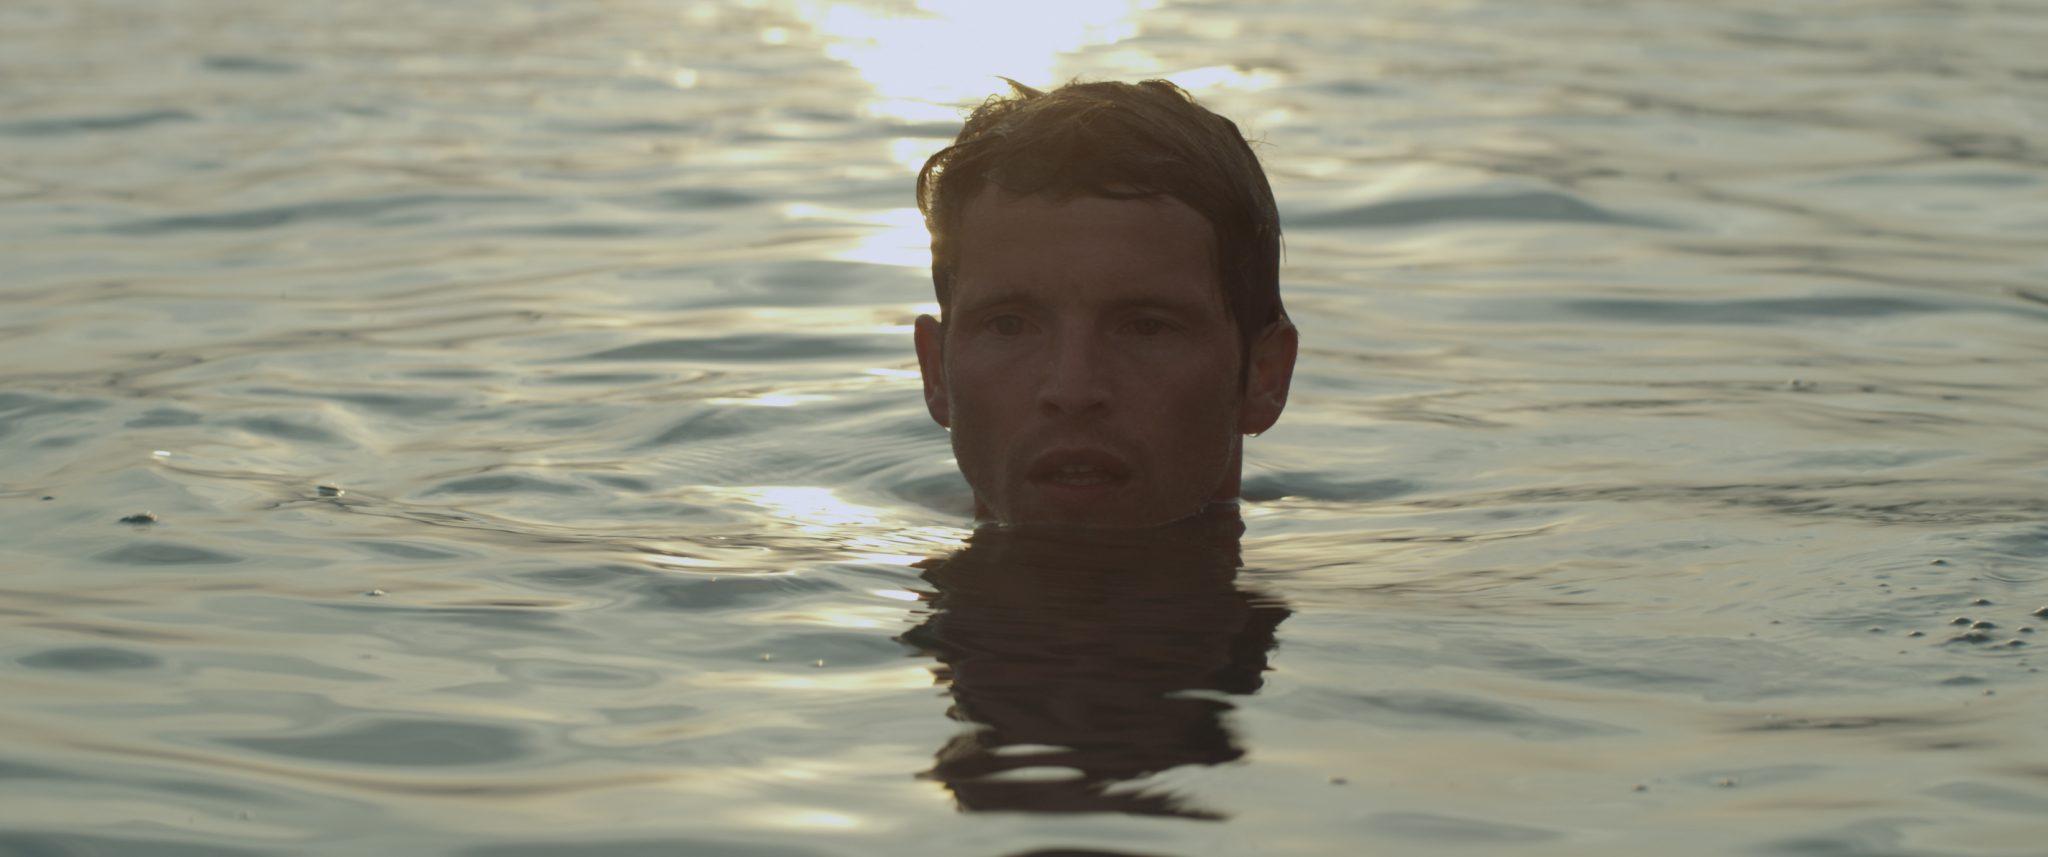 stranger_by_the_lake